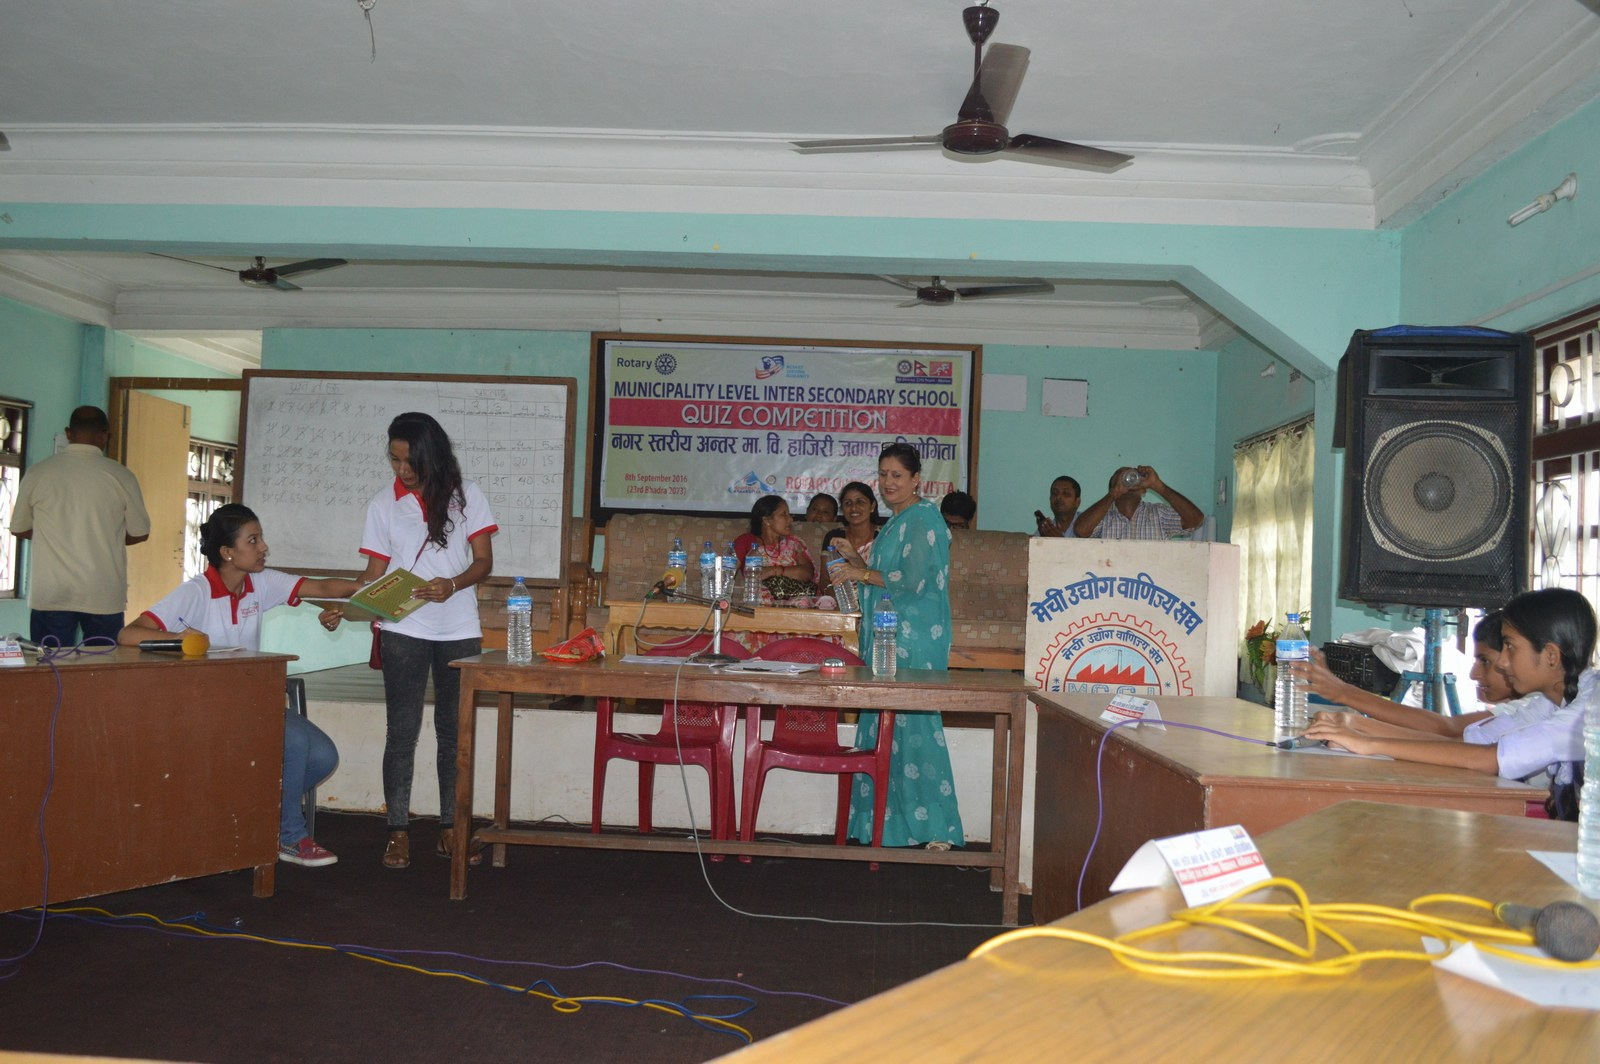 Municipality-Level-Inter-Secondary-School-Quiz-Contest-2016-Rotary-Club-of-Kakarvitta-28